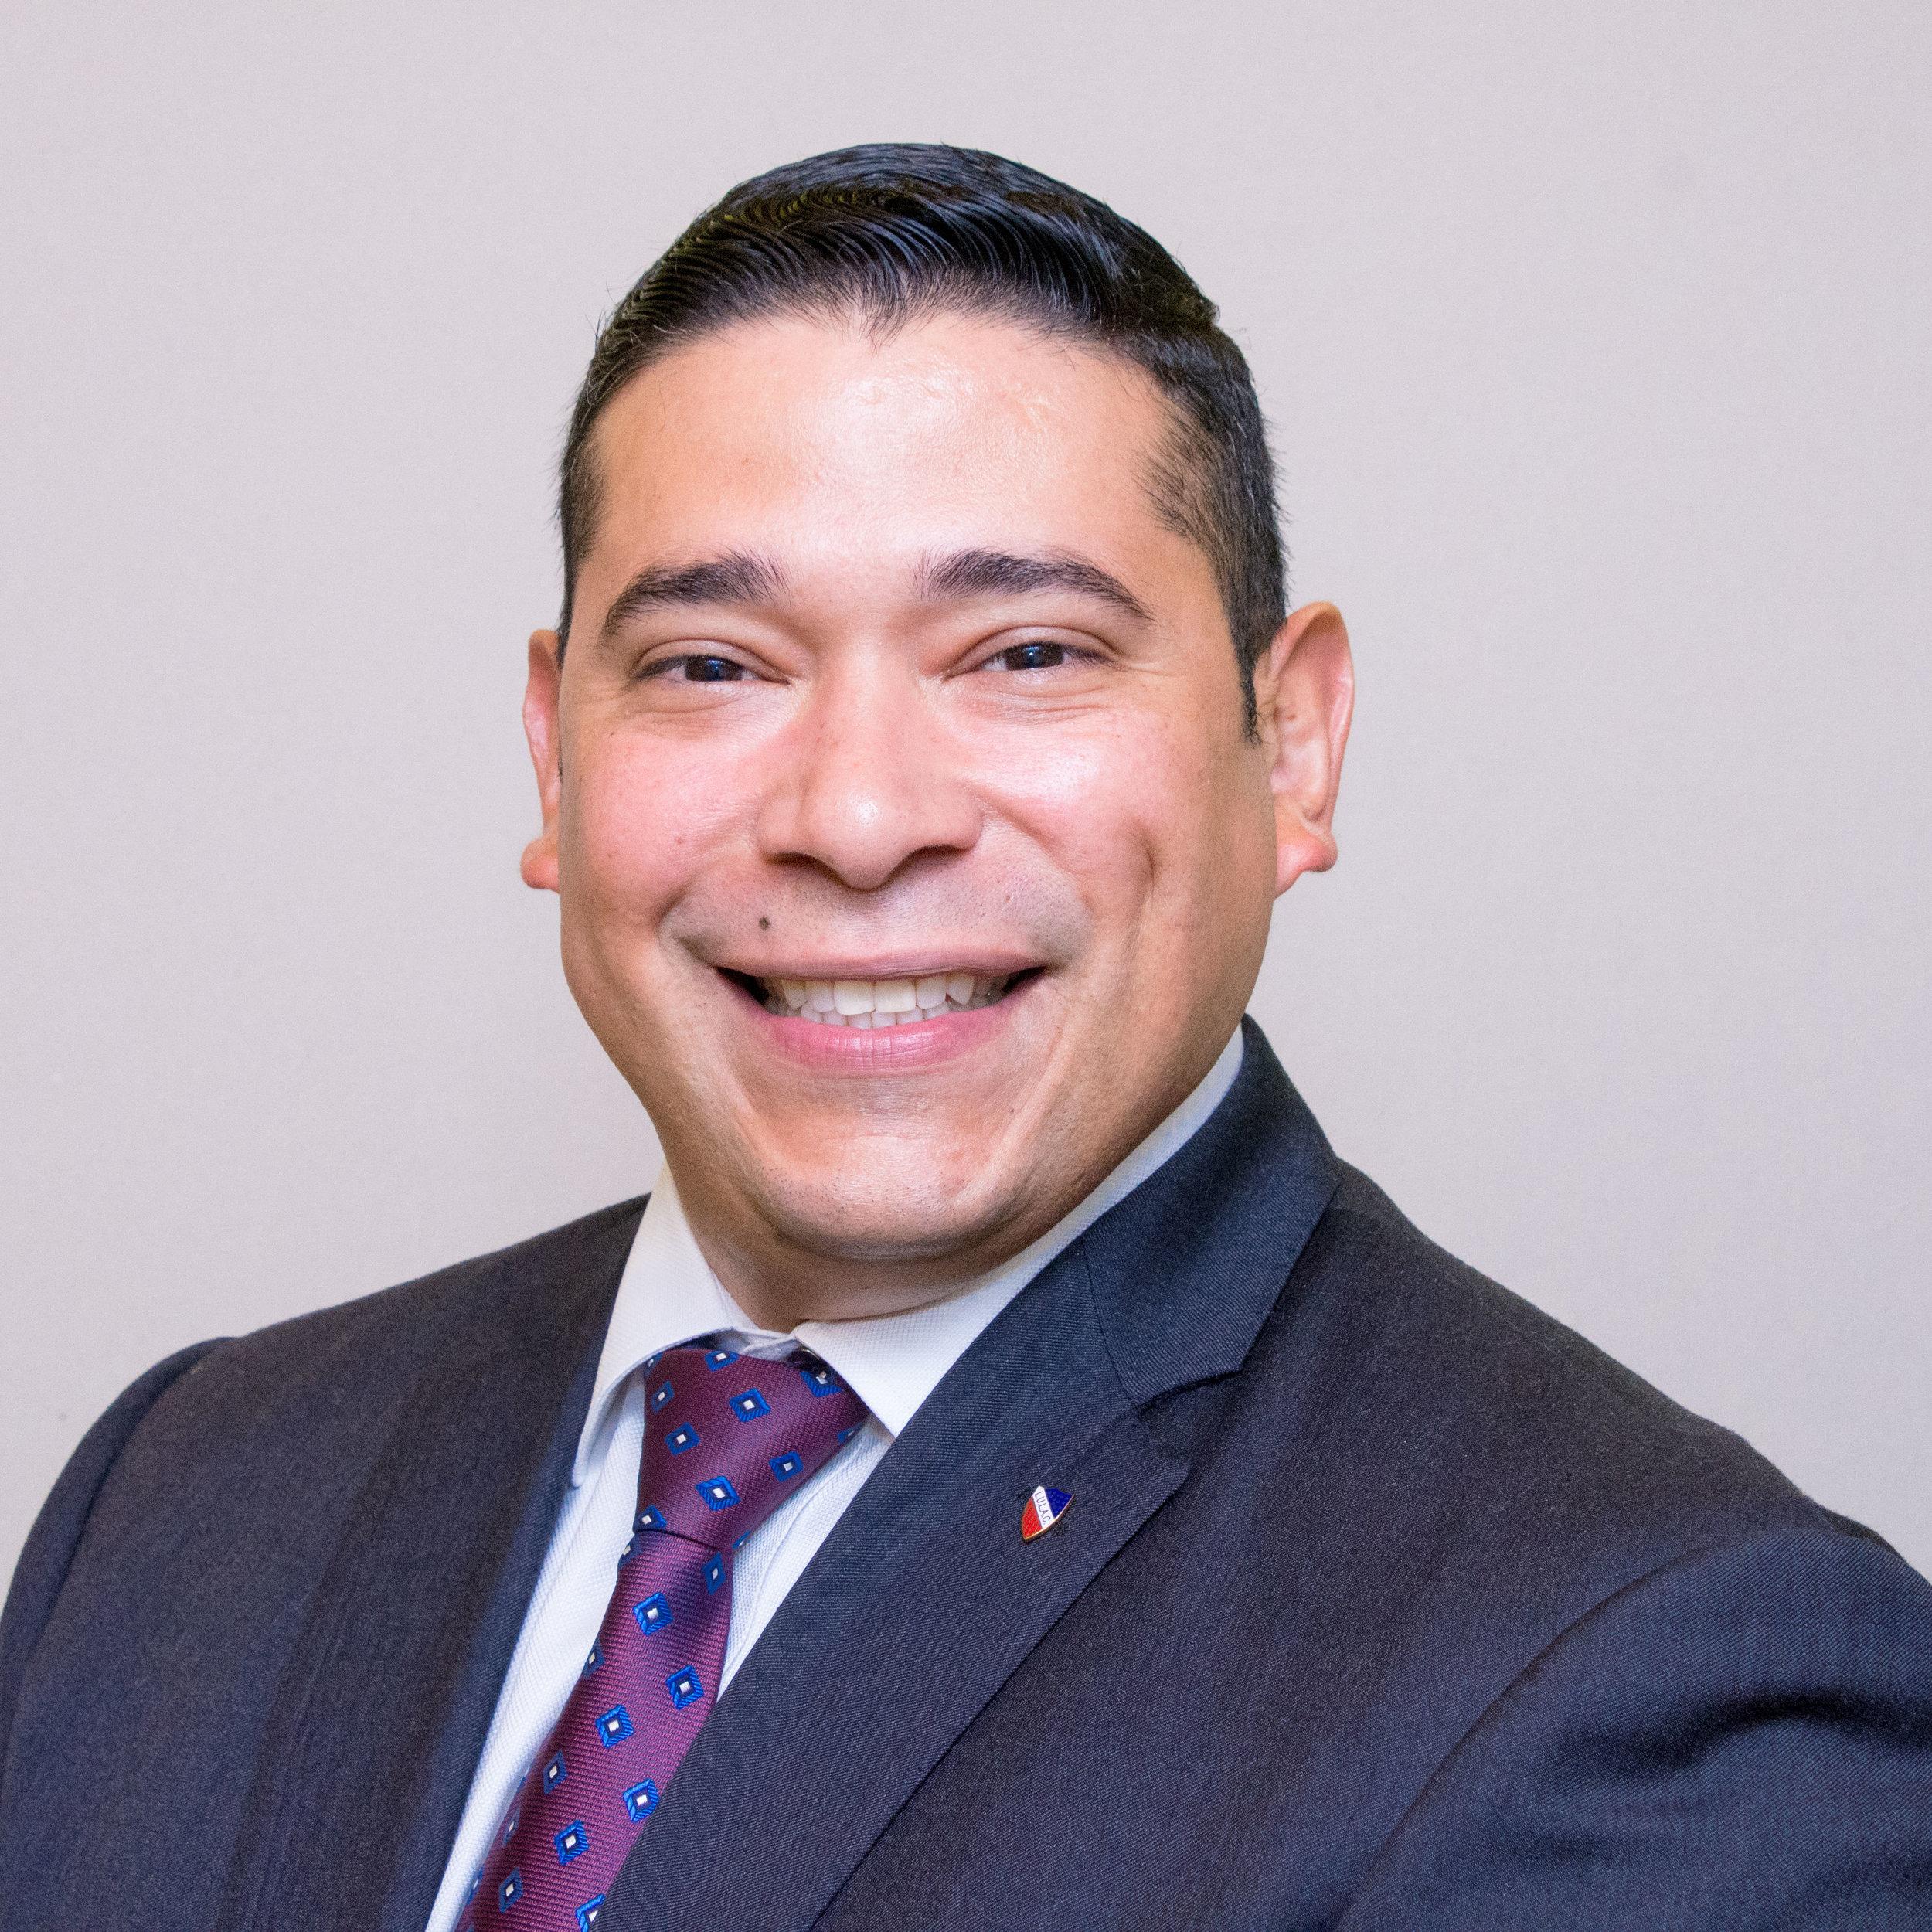 Daniel Saenz, IT Consultant, Nieto Technology Partner